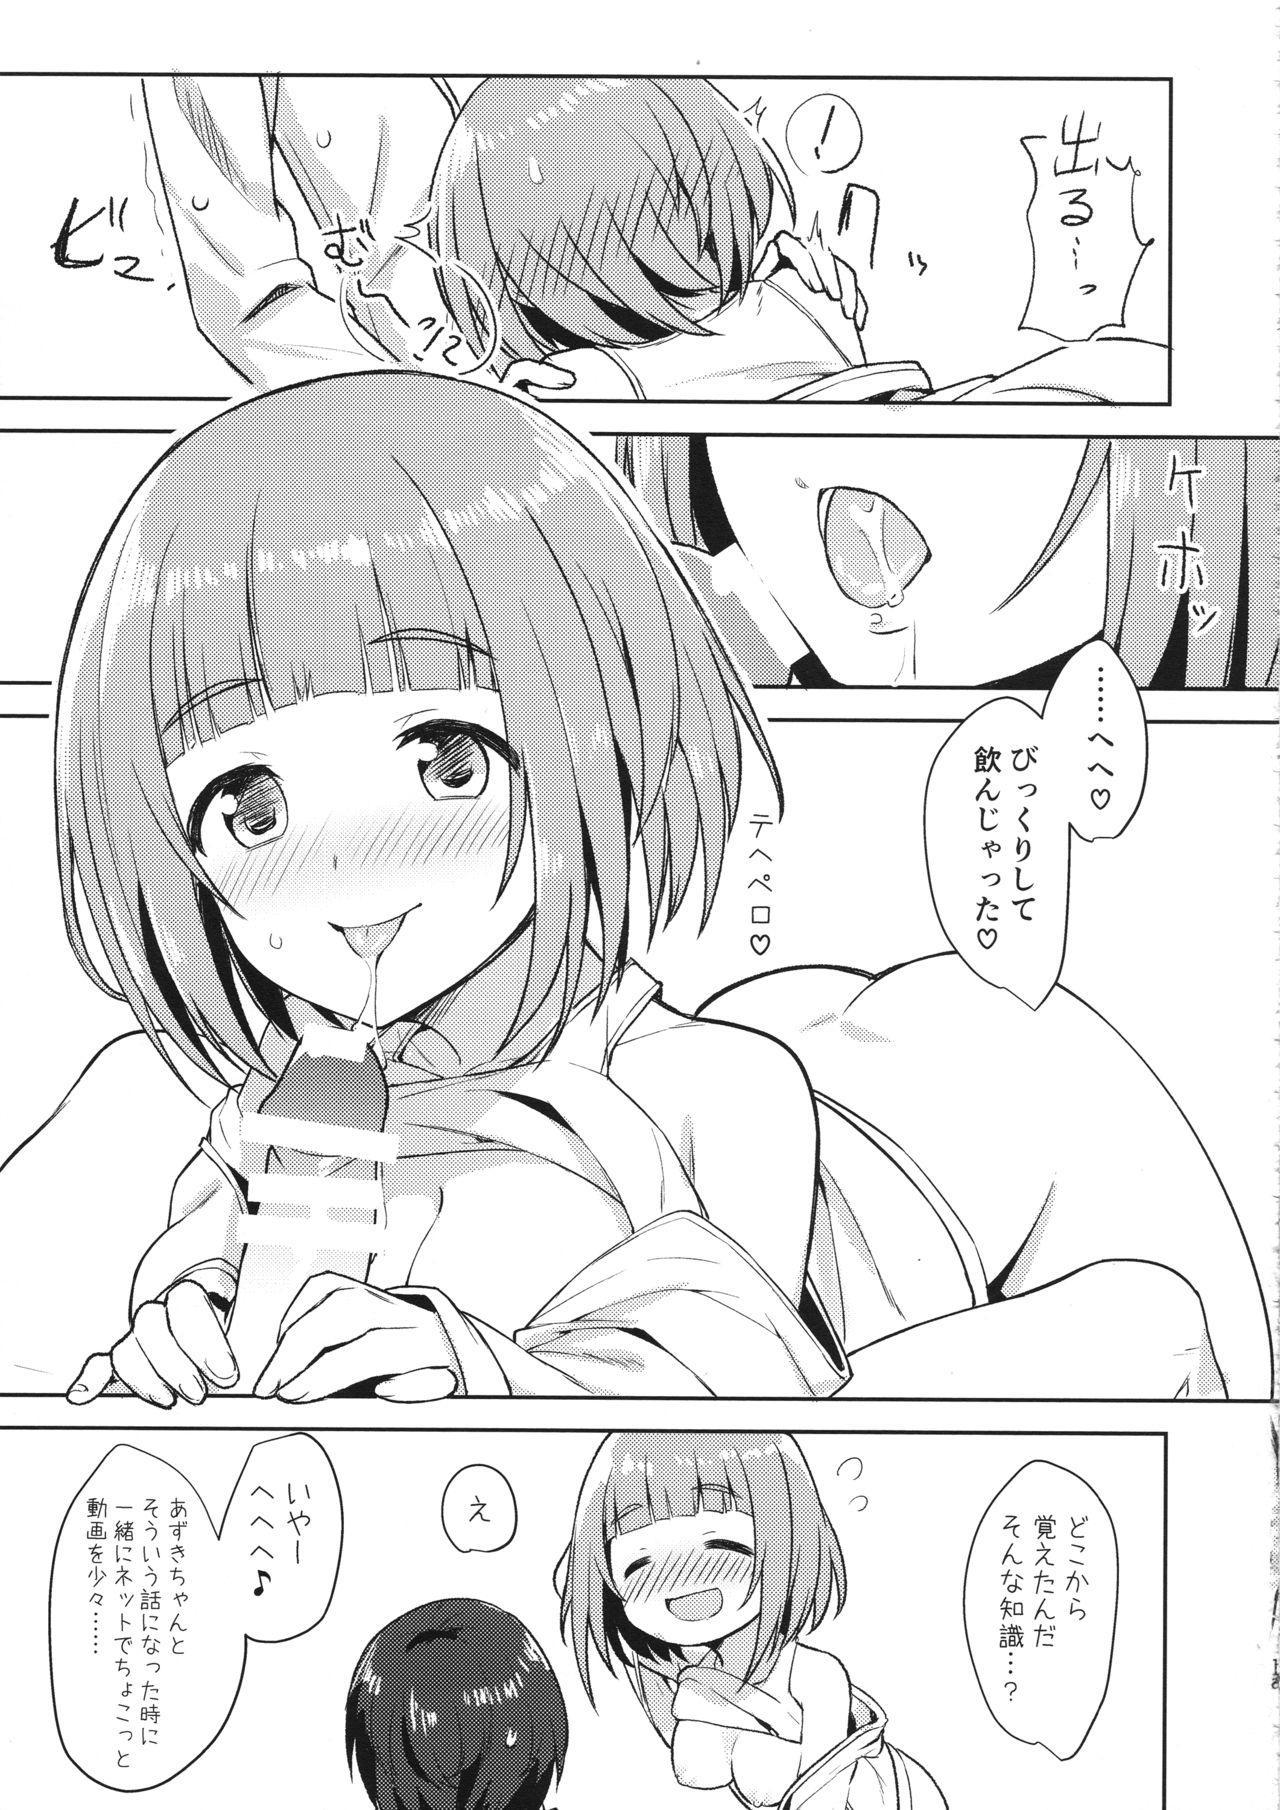 Yuzu no Ecchi na Hon 15